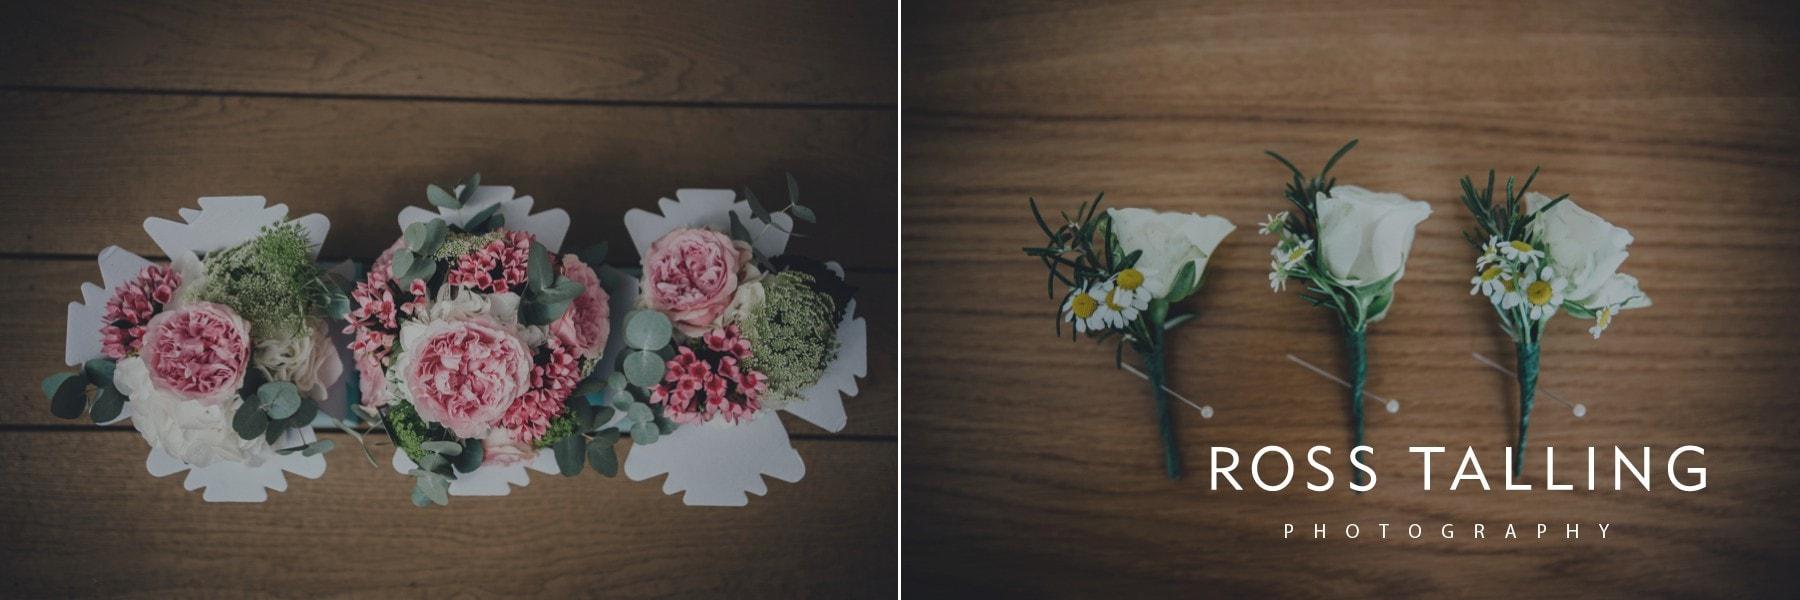 laura-matts-rosevine-hotel-wedding-photography-cornwall_0014